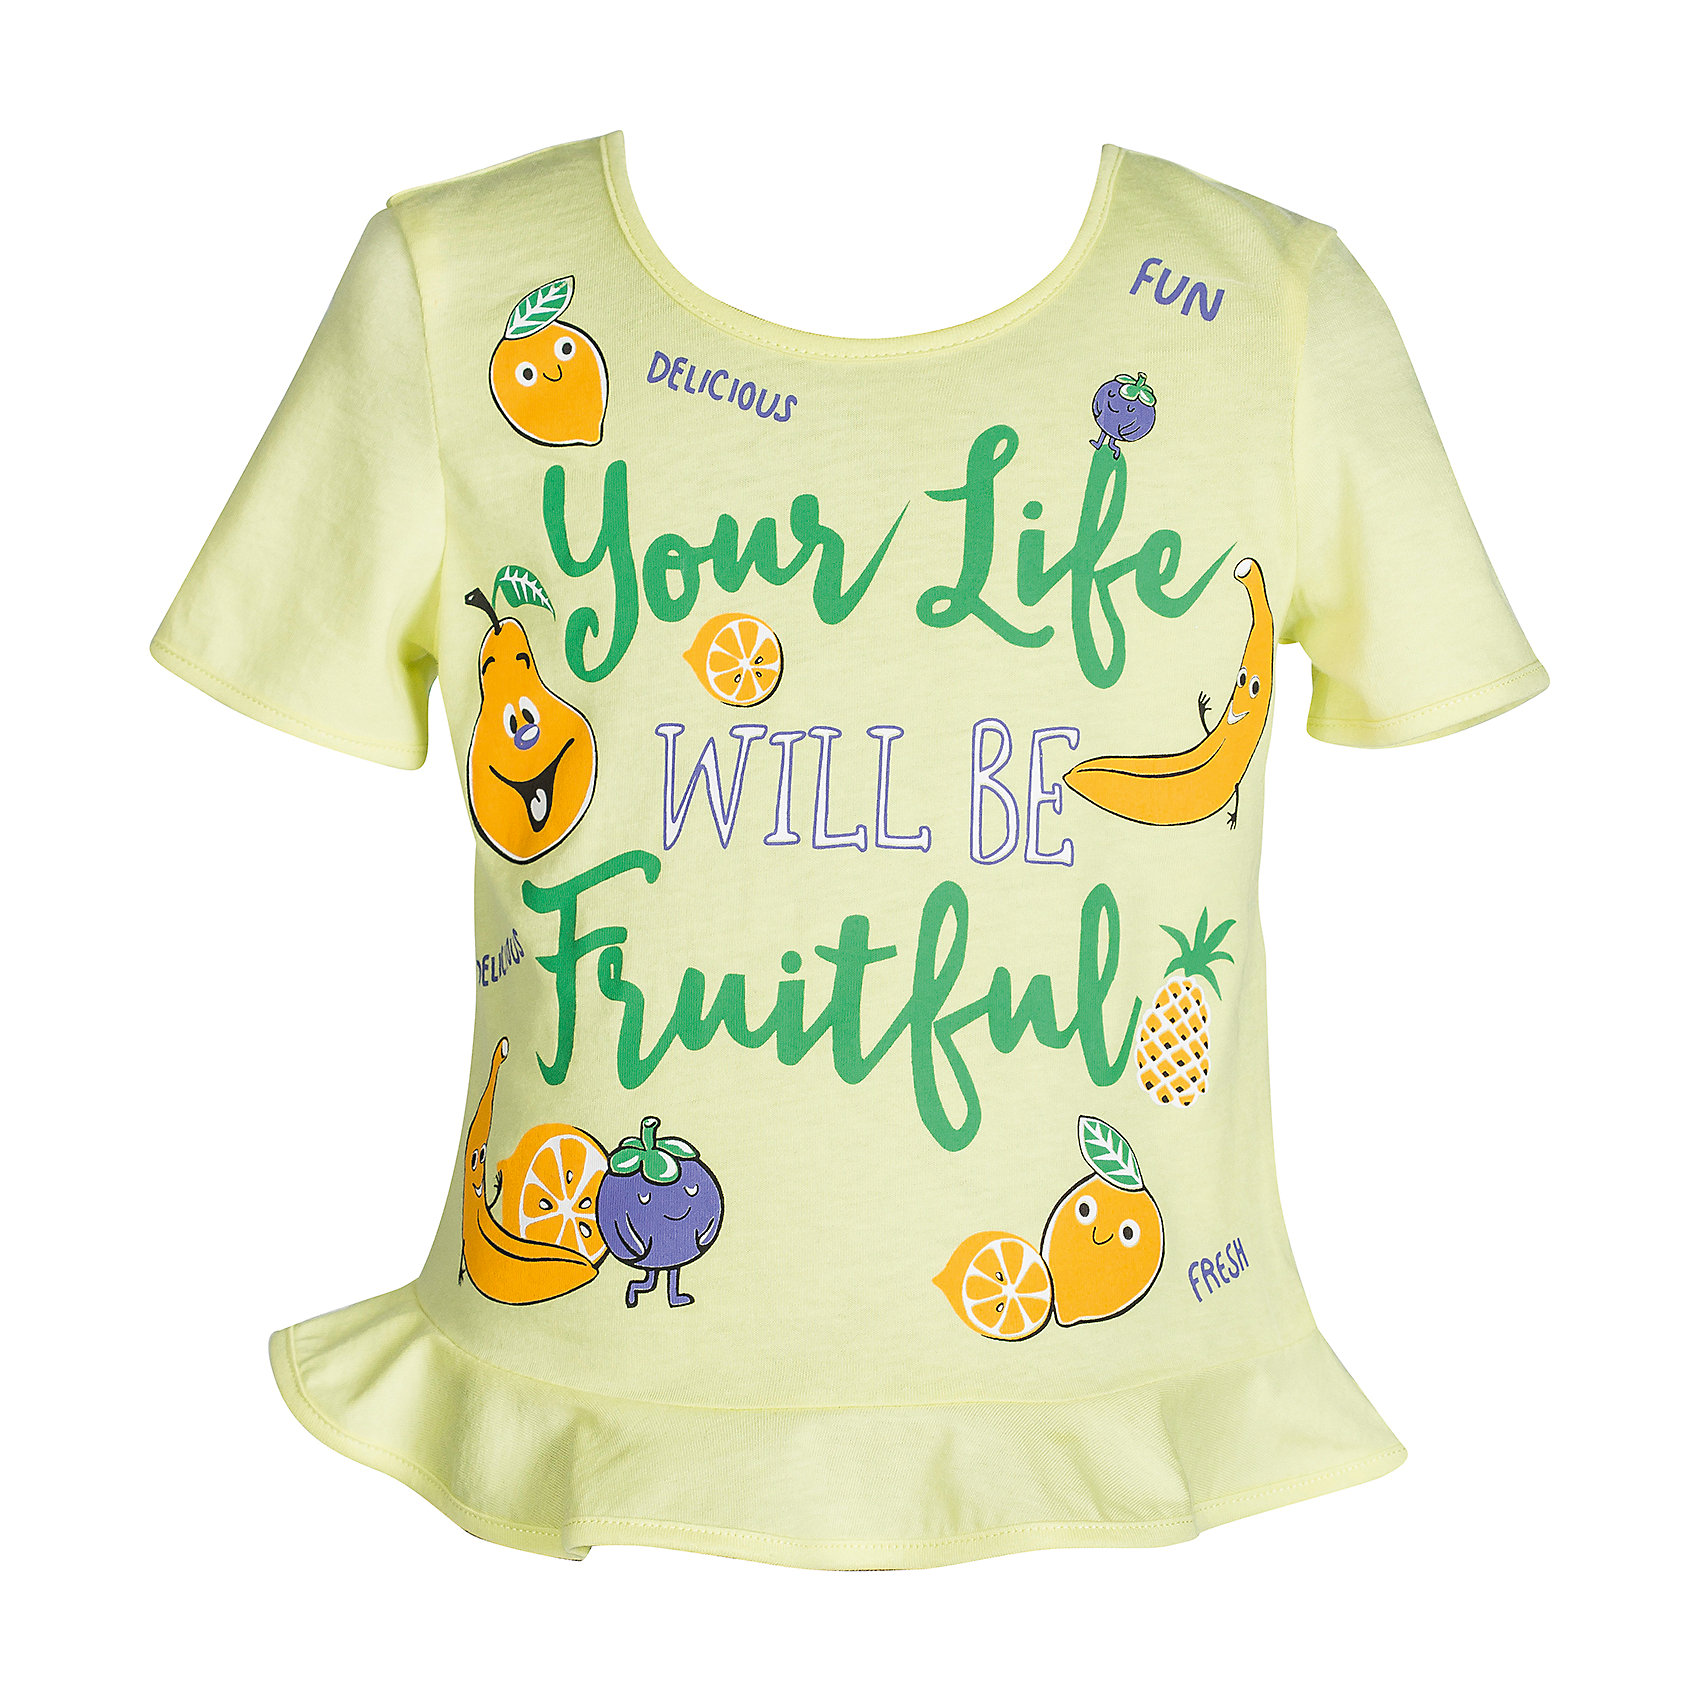 Bell Bimbo Футболка для девочки Bell Bimbo bell bimbo комплект футболка и юбка для девочки bell bimbo